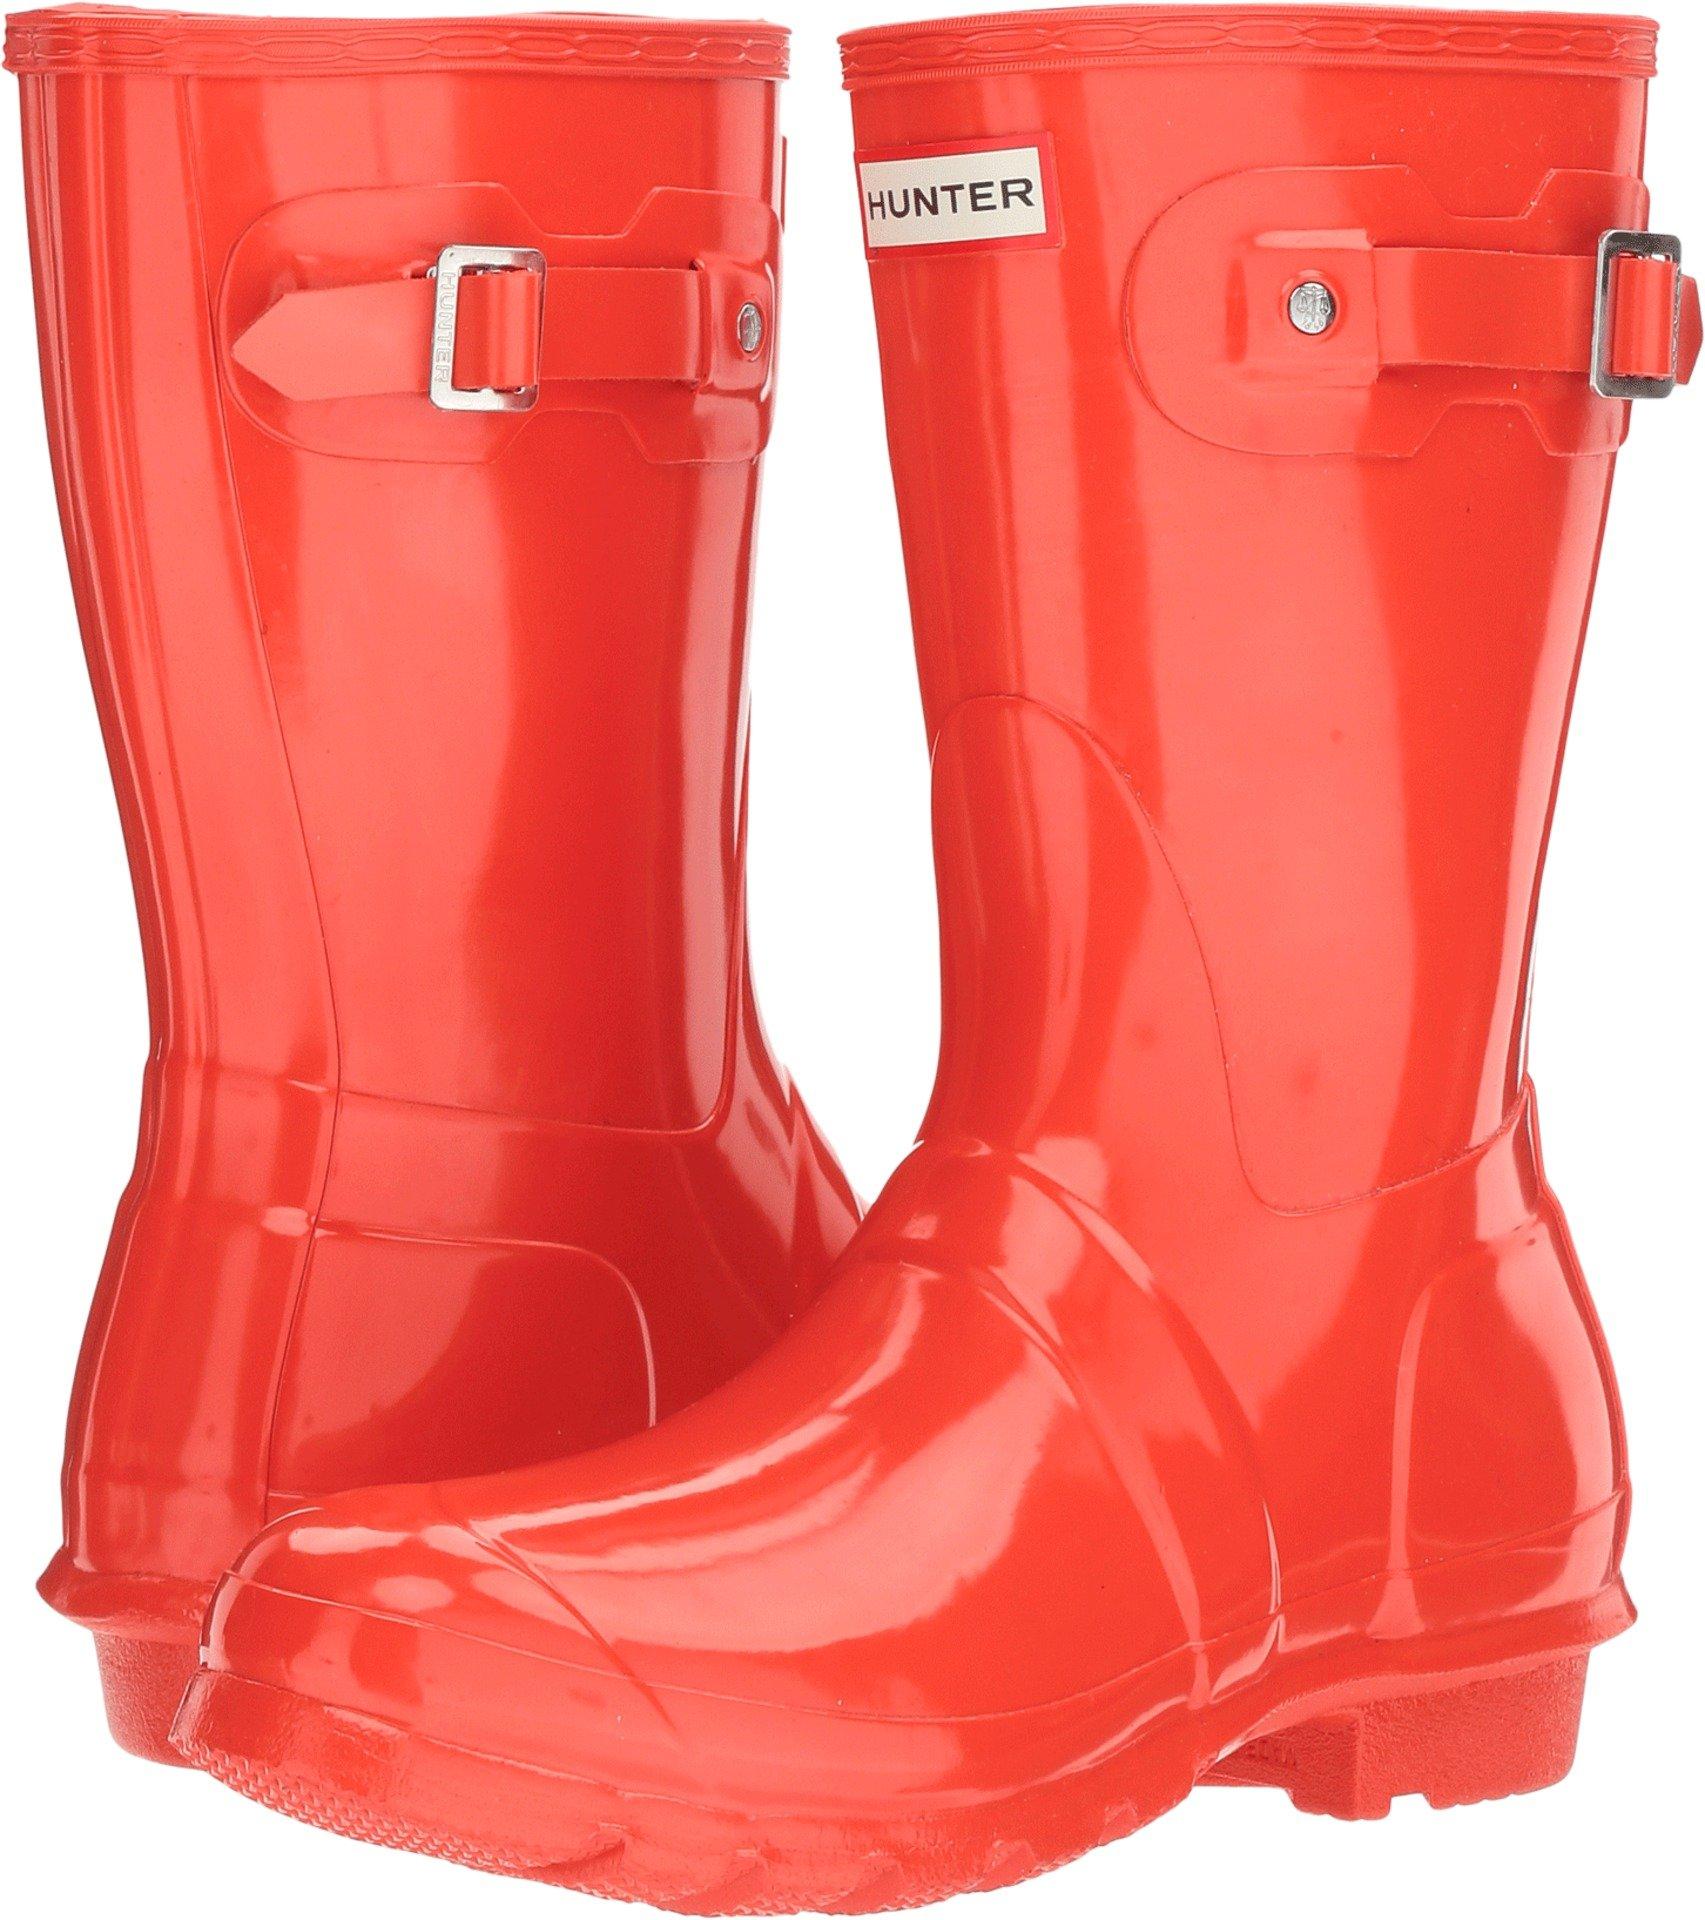 Hunter Women's Original Short Gloss Orange Rain Boots - 8 B(M) US